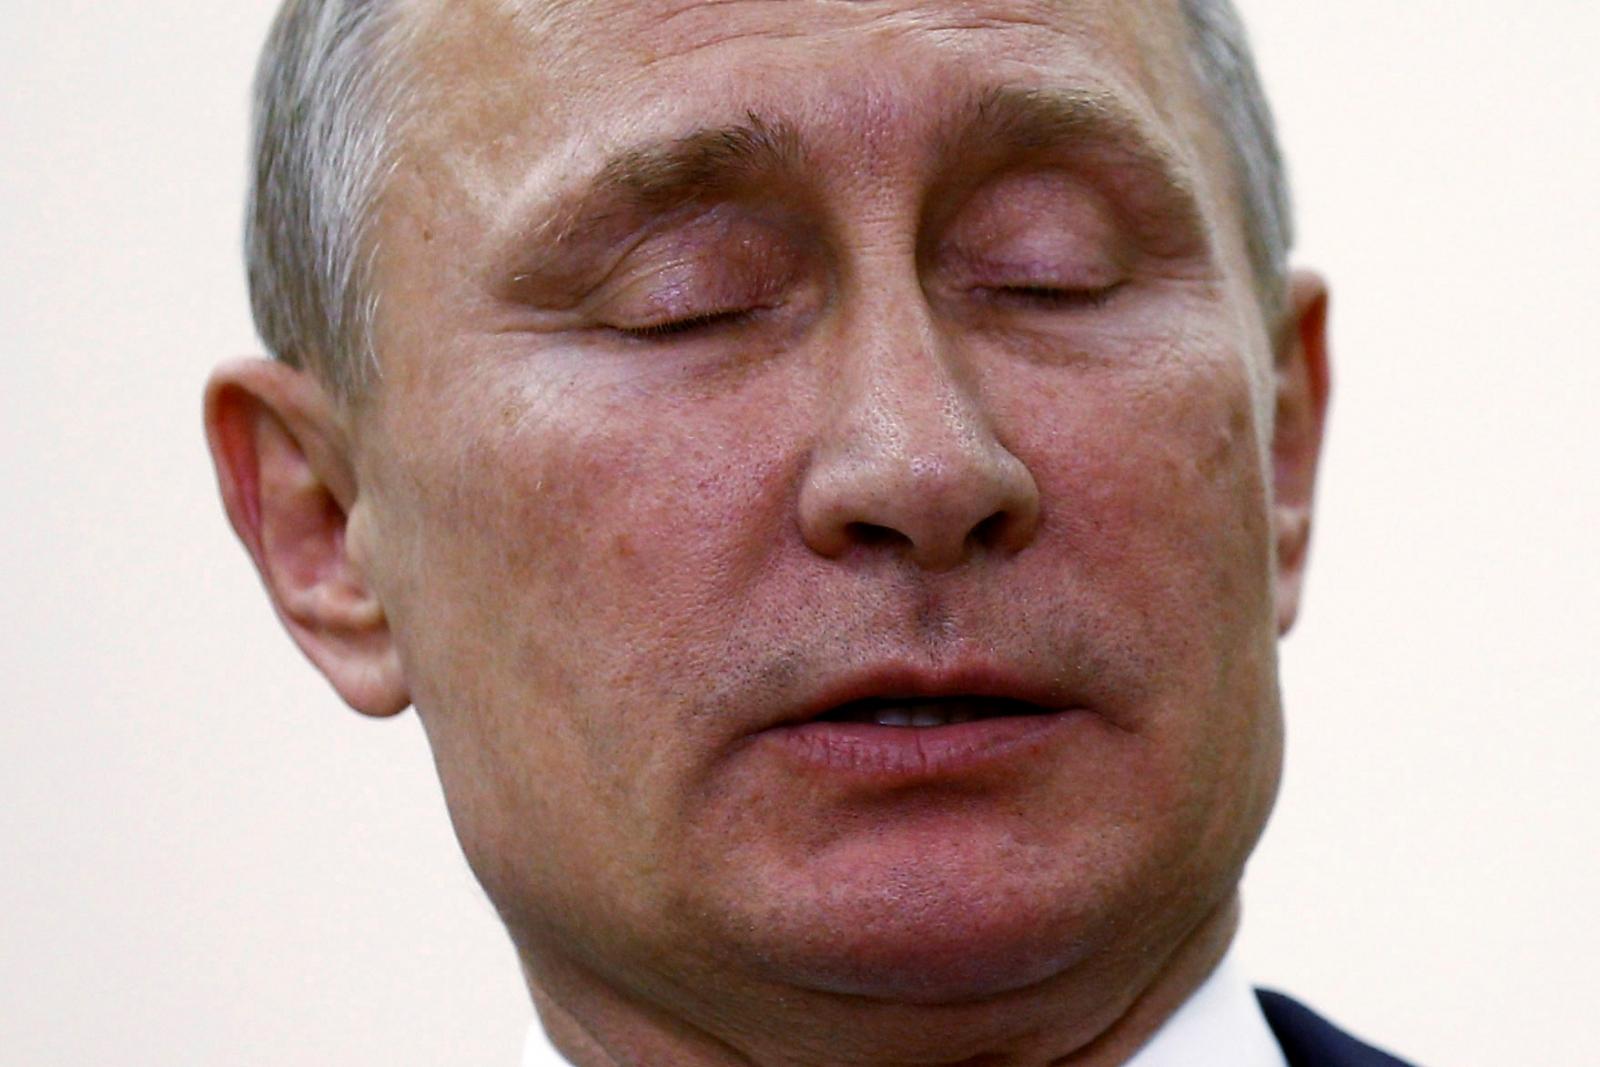 Putin's talks with Trump and Merkel